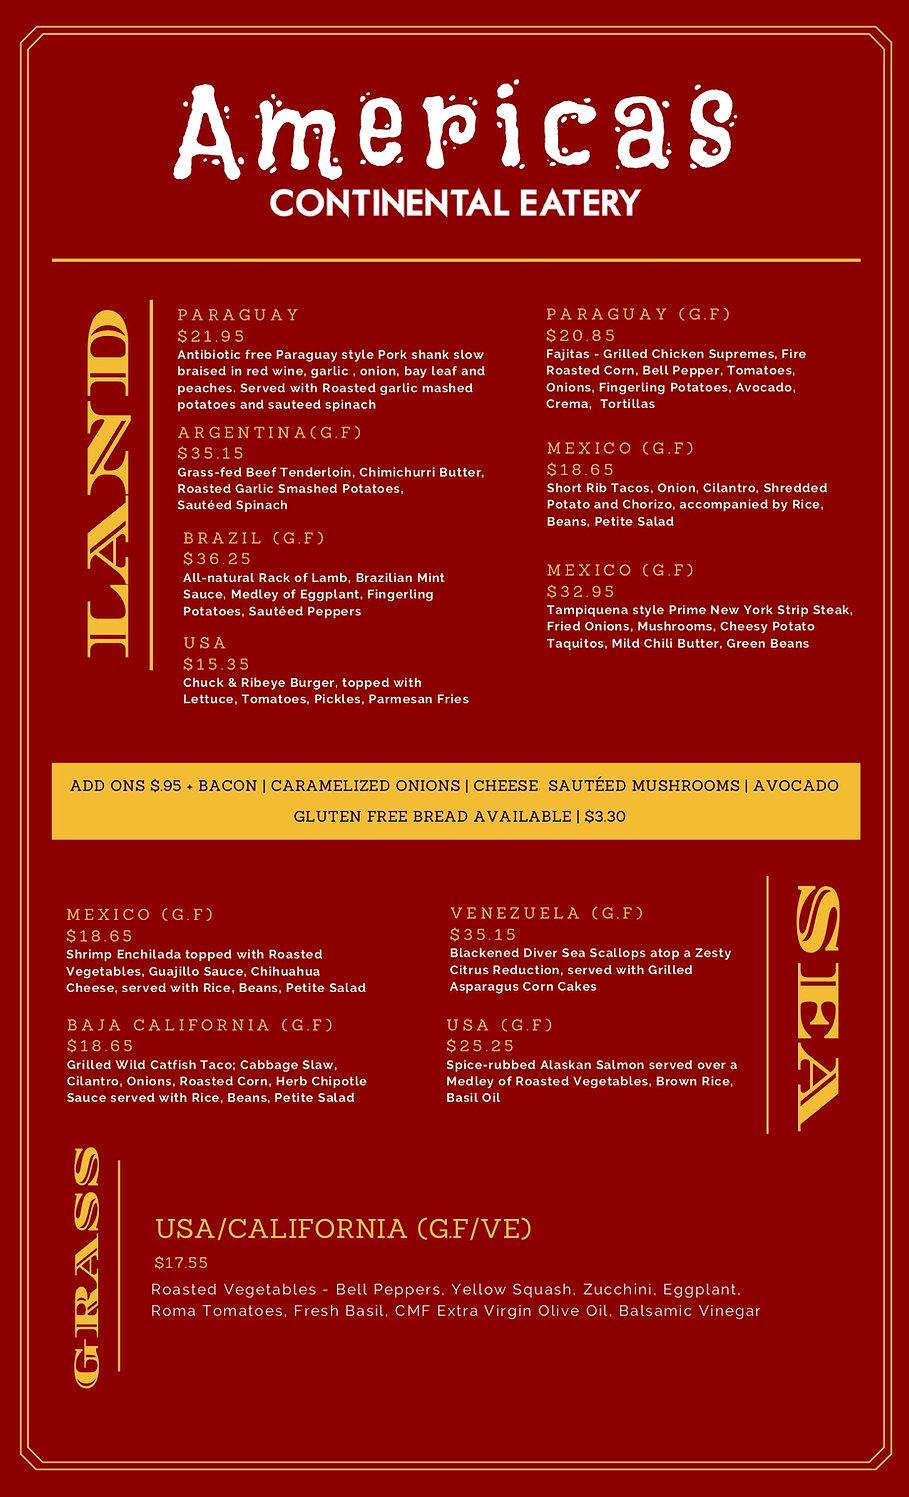 Americas Dinner-new prices 2.jpg